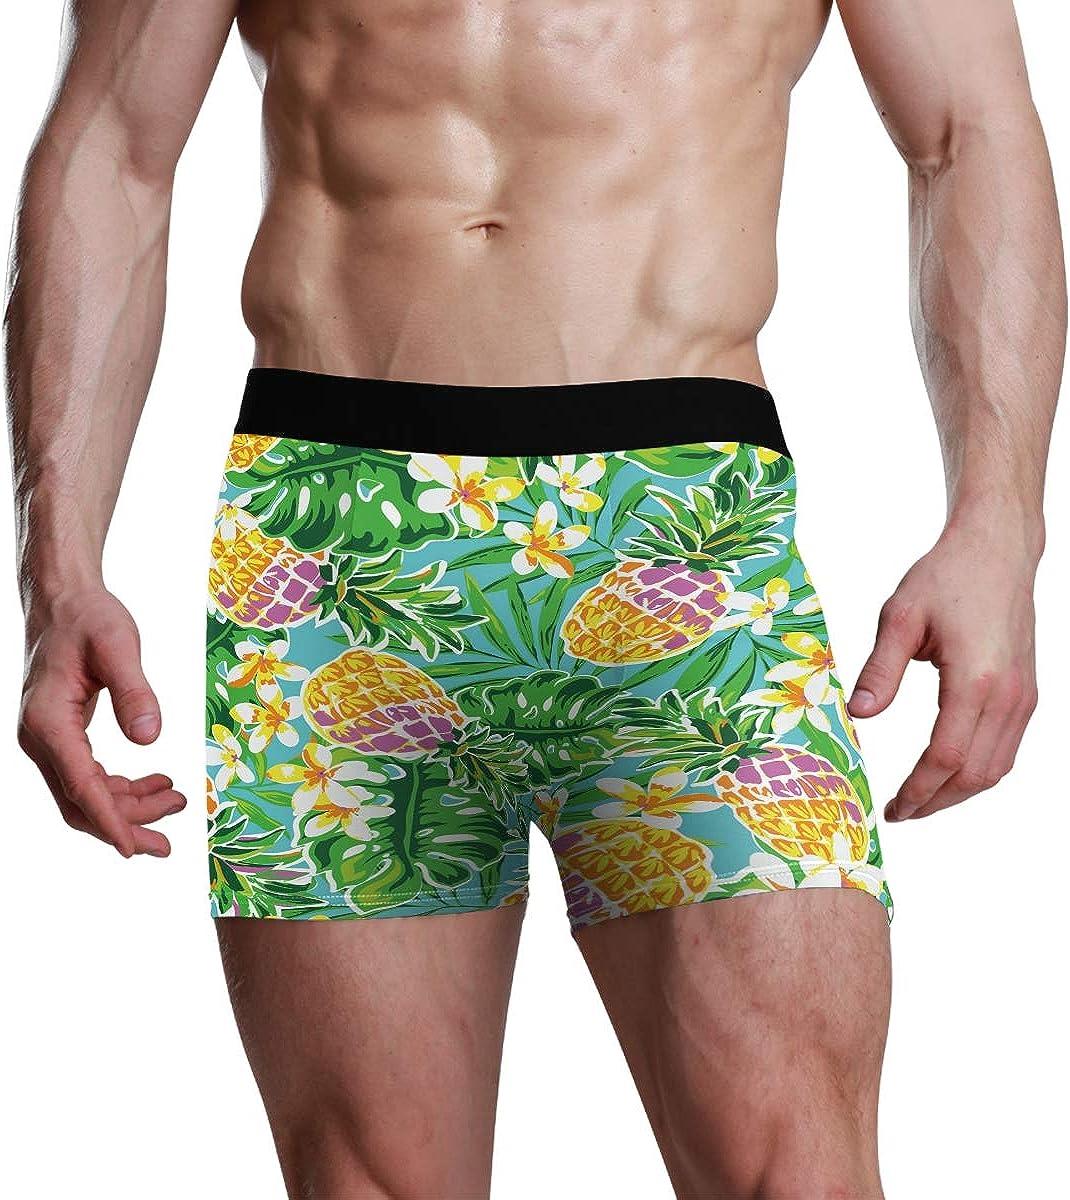 Mens Underwear Boxers Vector Forest Series Seamless Mosaic Pattern ComfortSoft Boxer Briefs Breathable Bikini